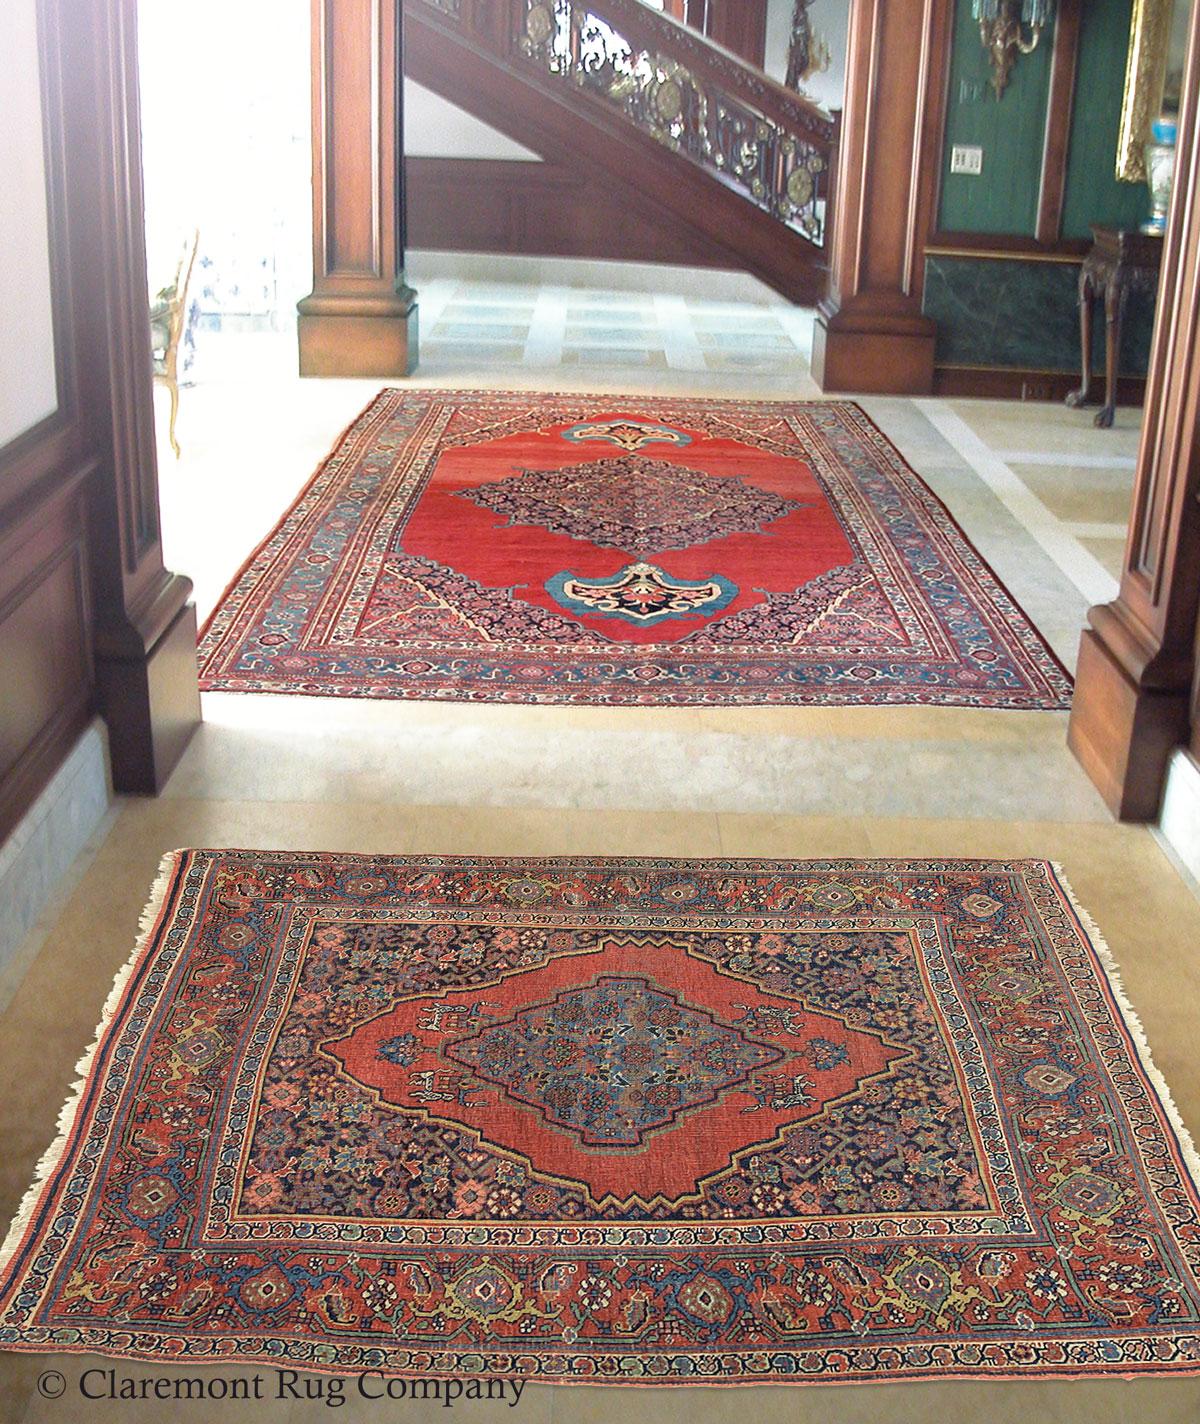 Bijar (Bidjar) Carpet Pair Fills A Formal Interior With